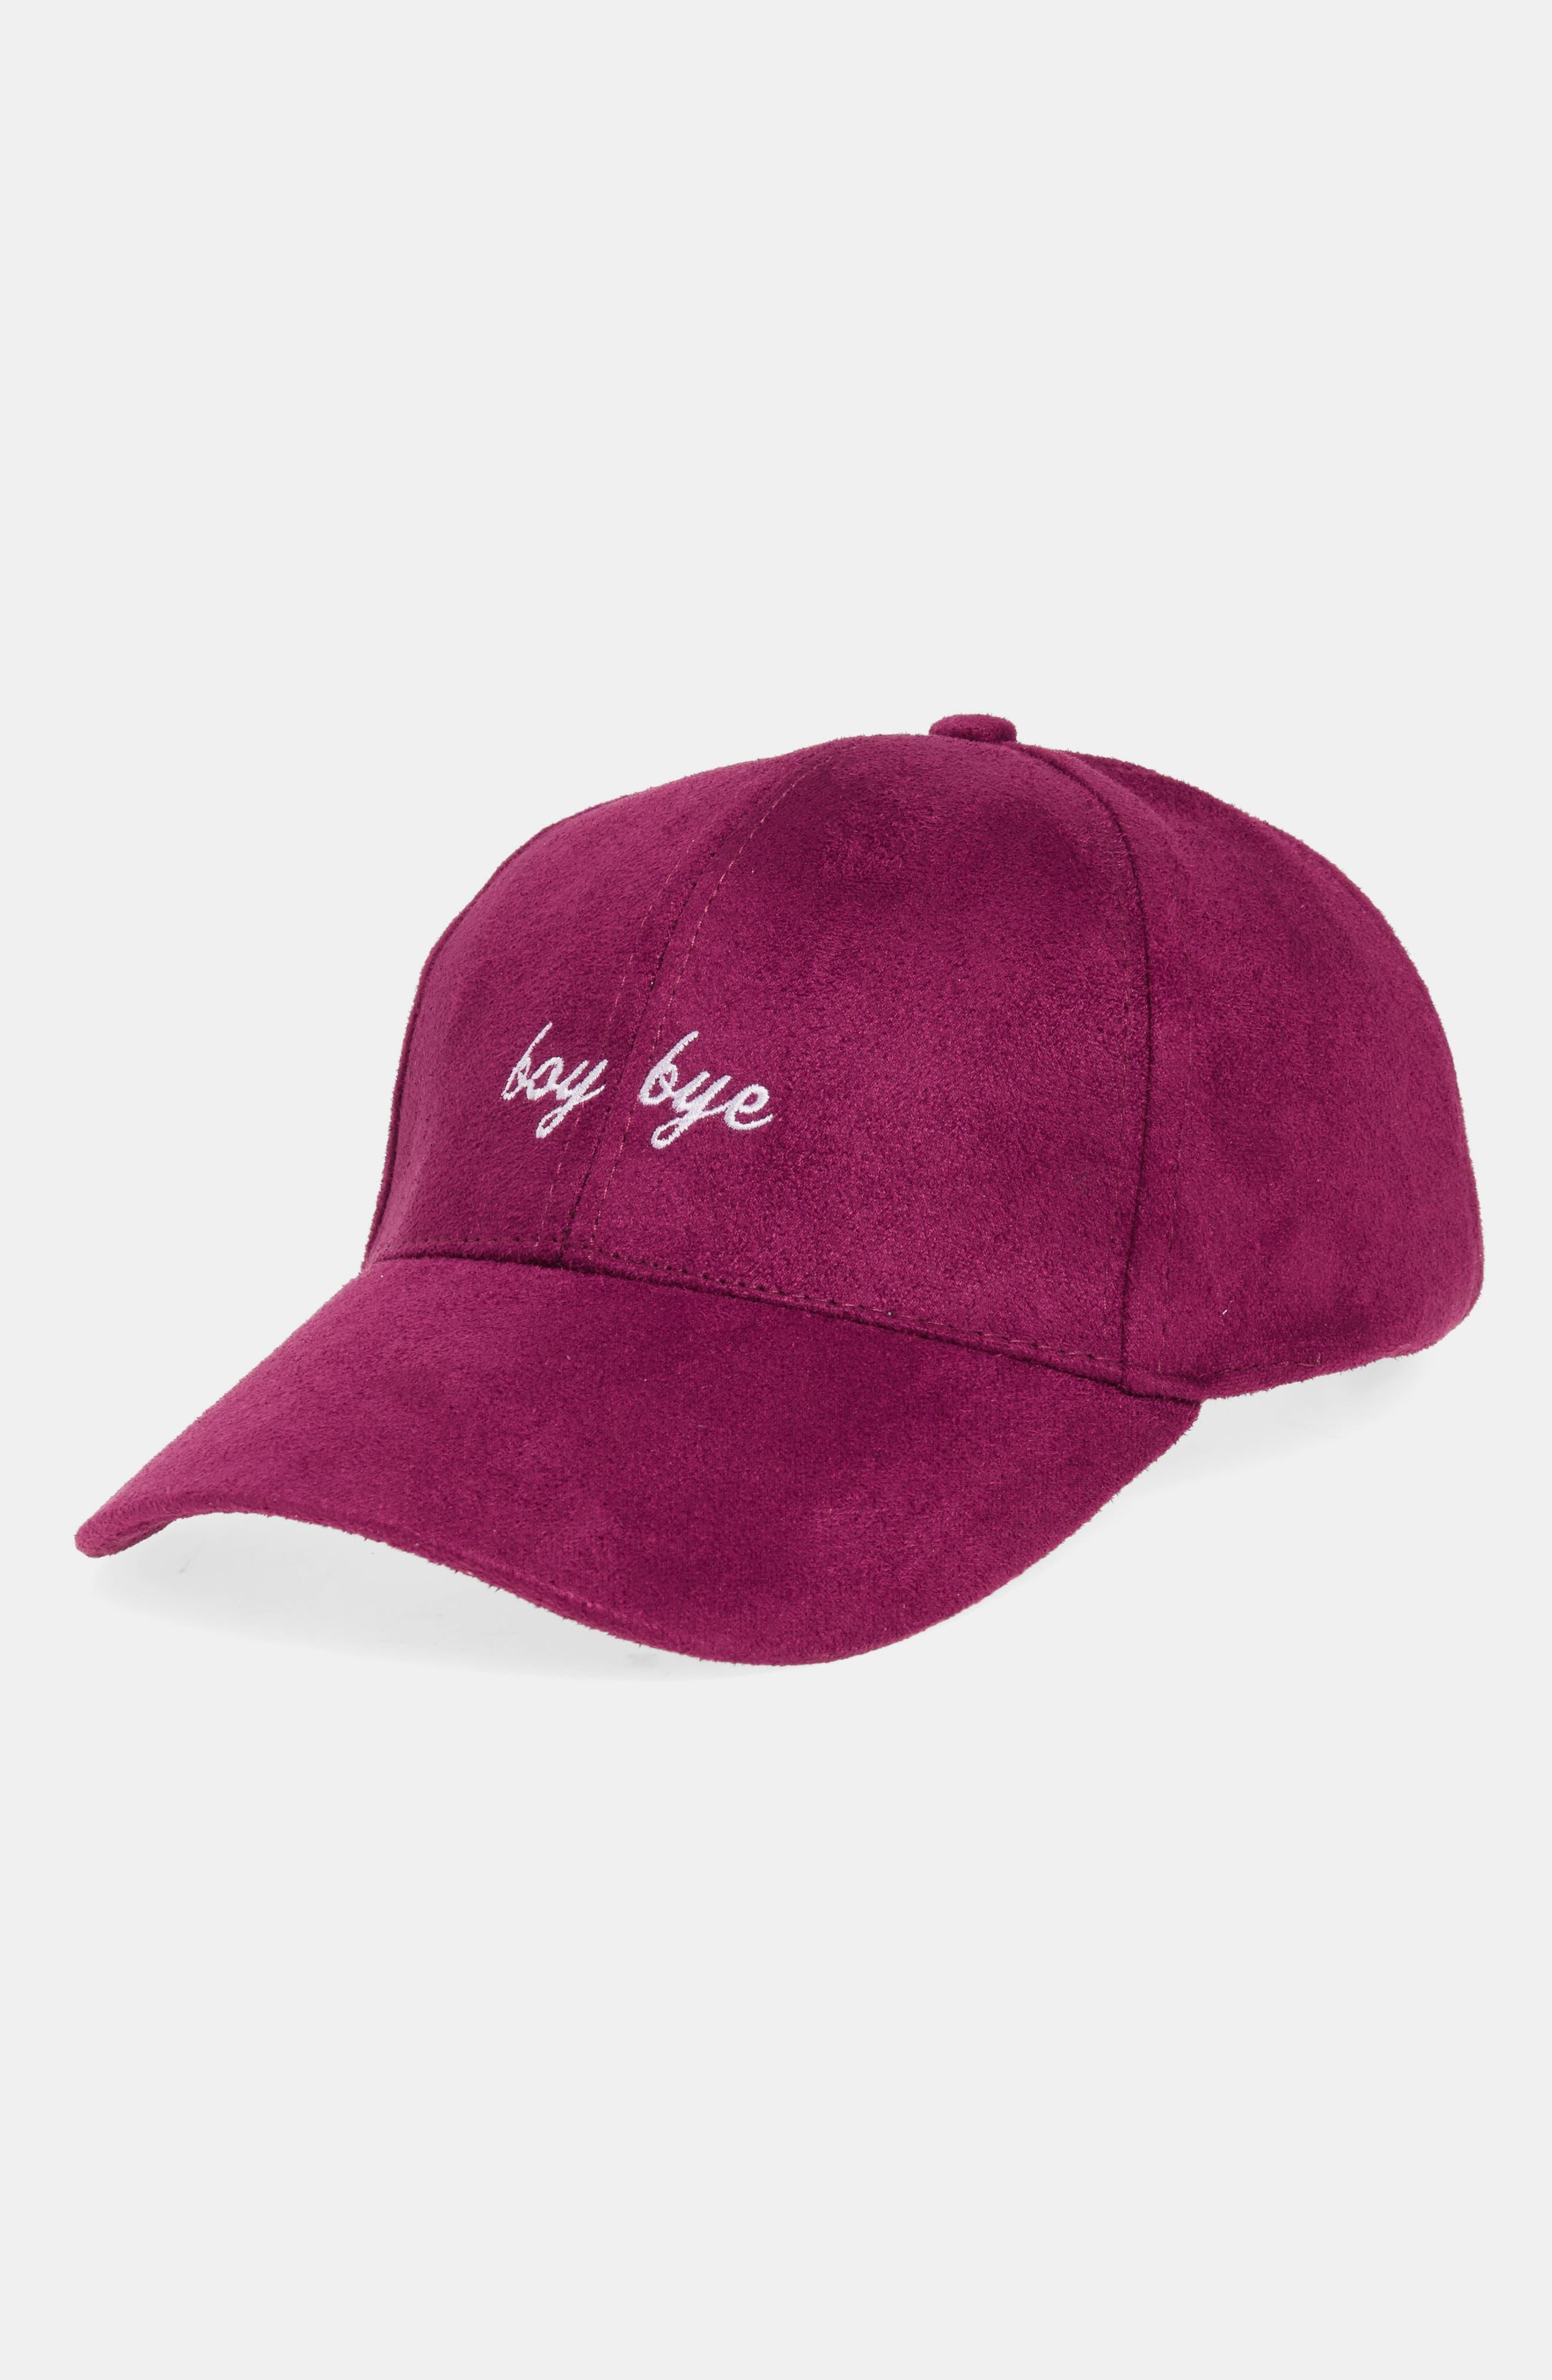 NYC Underground Boy Bye Ball Cap